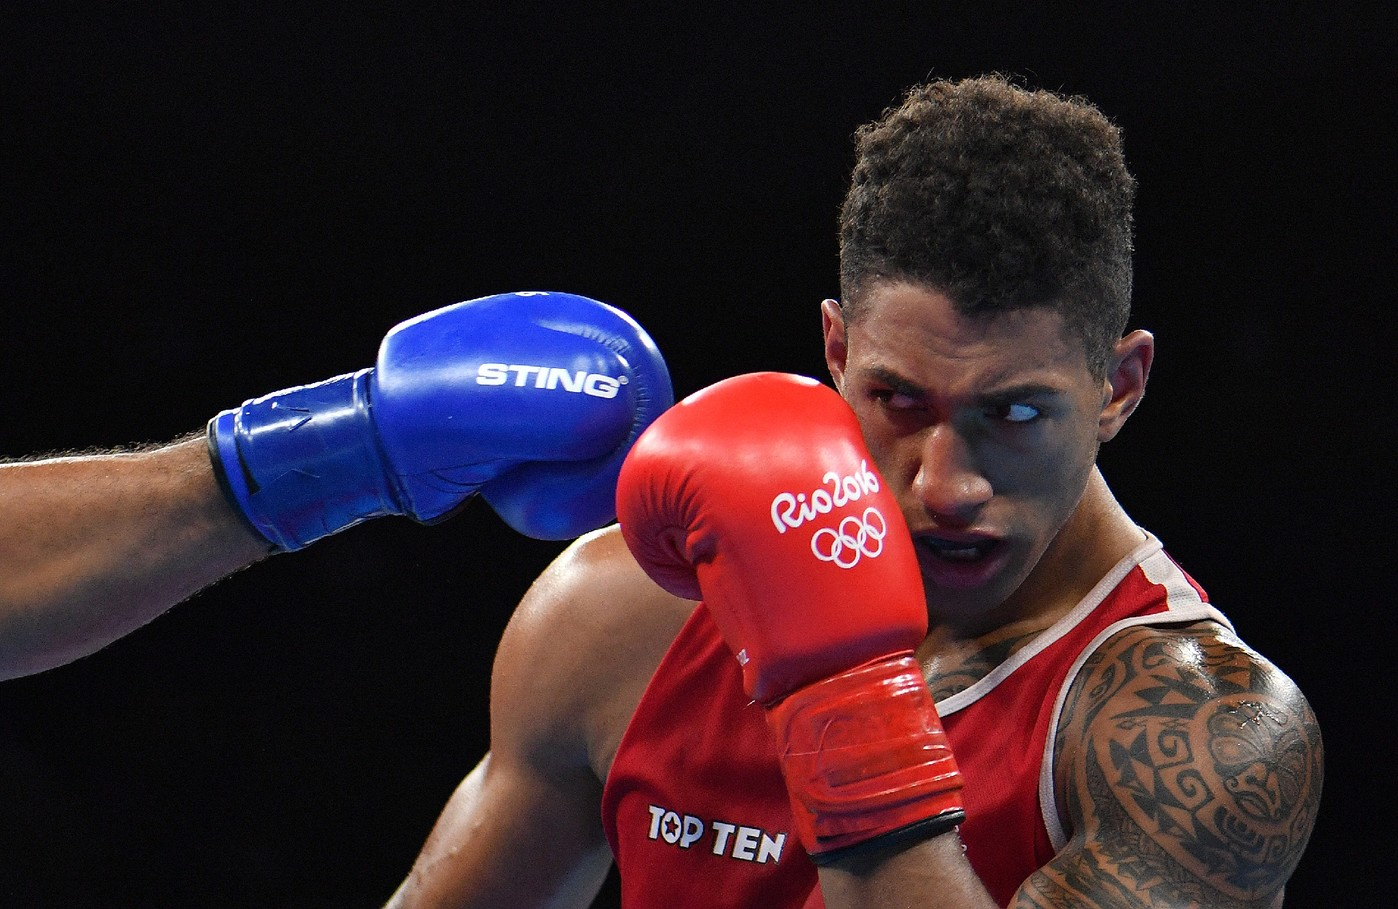 boxeur-francais-Tony-Yokade-finale-olympique-poids-lourds-21-2016-durant-Olympiques-Rio_0_1400_909